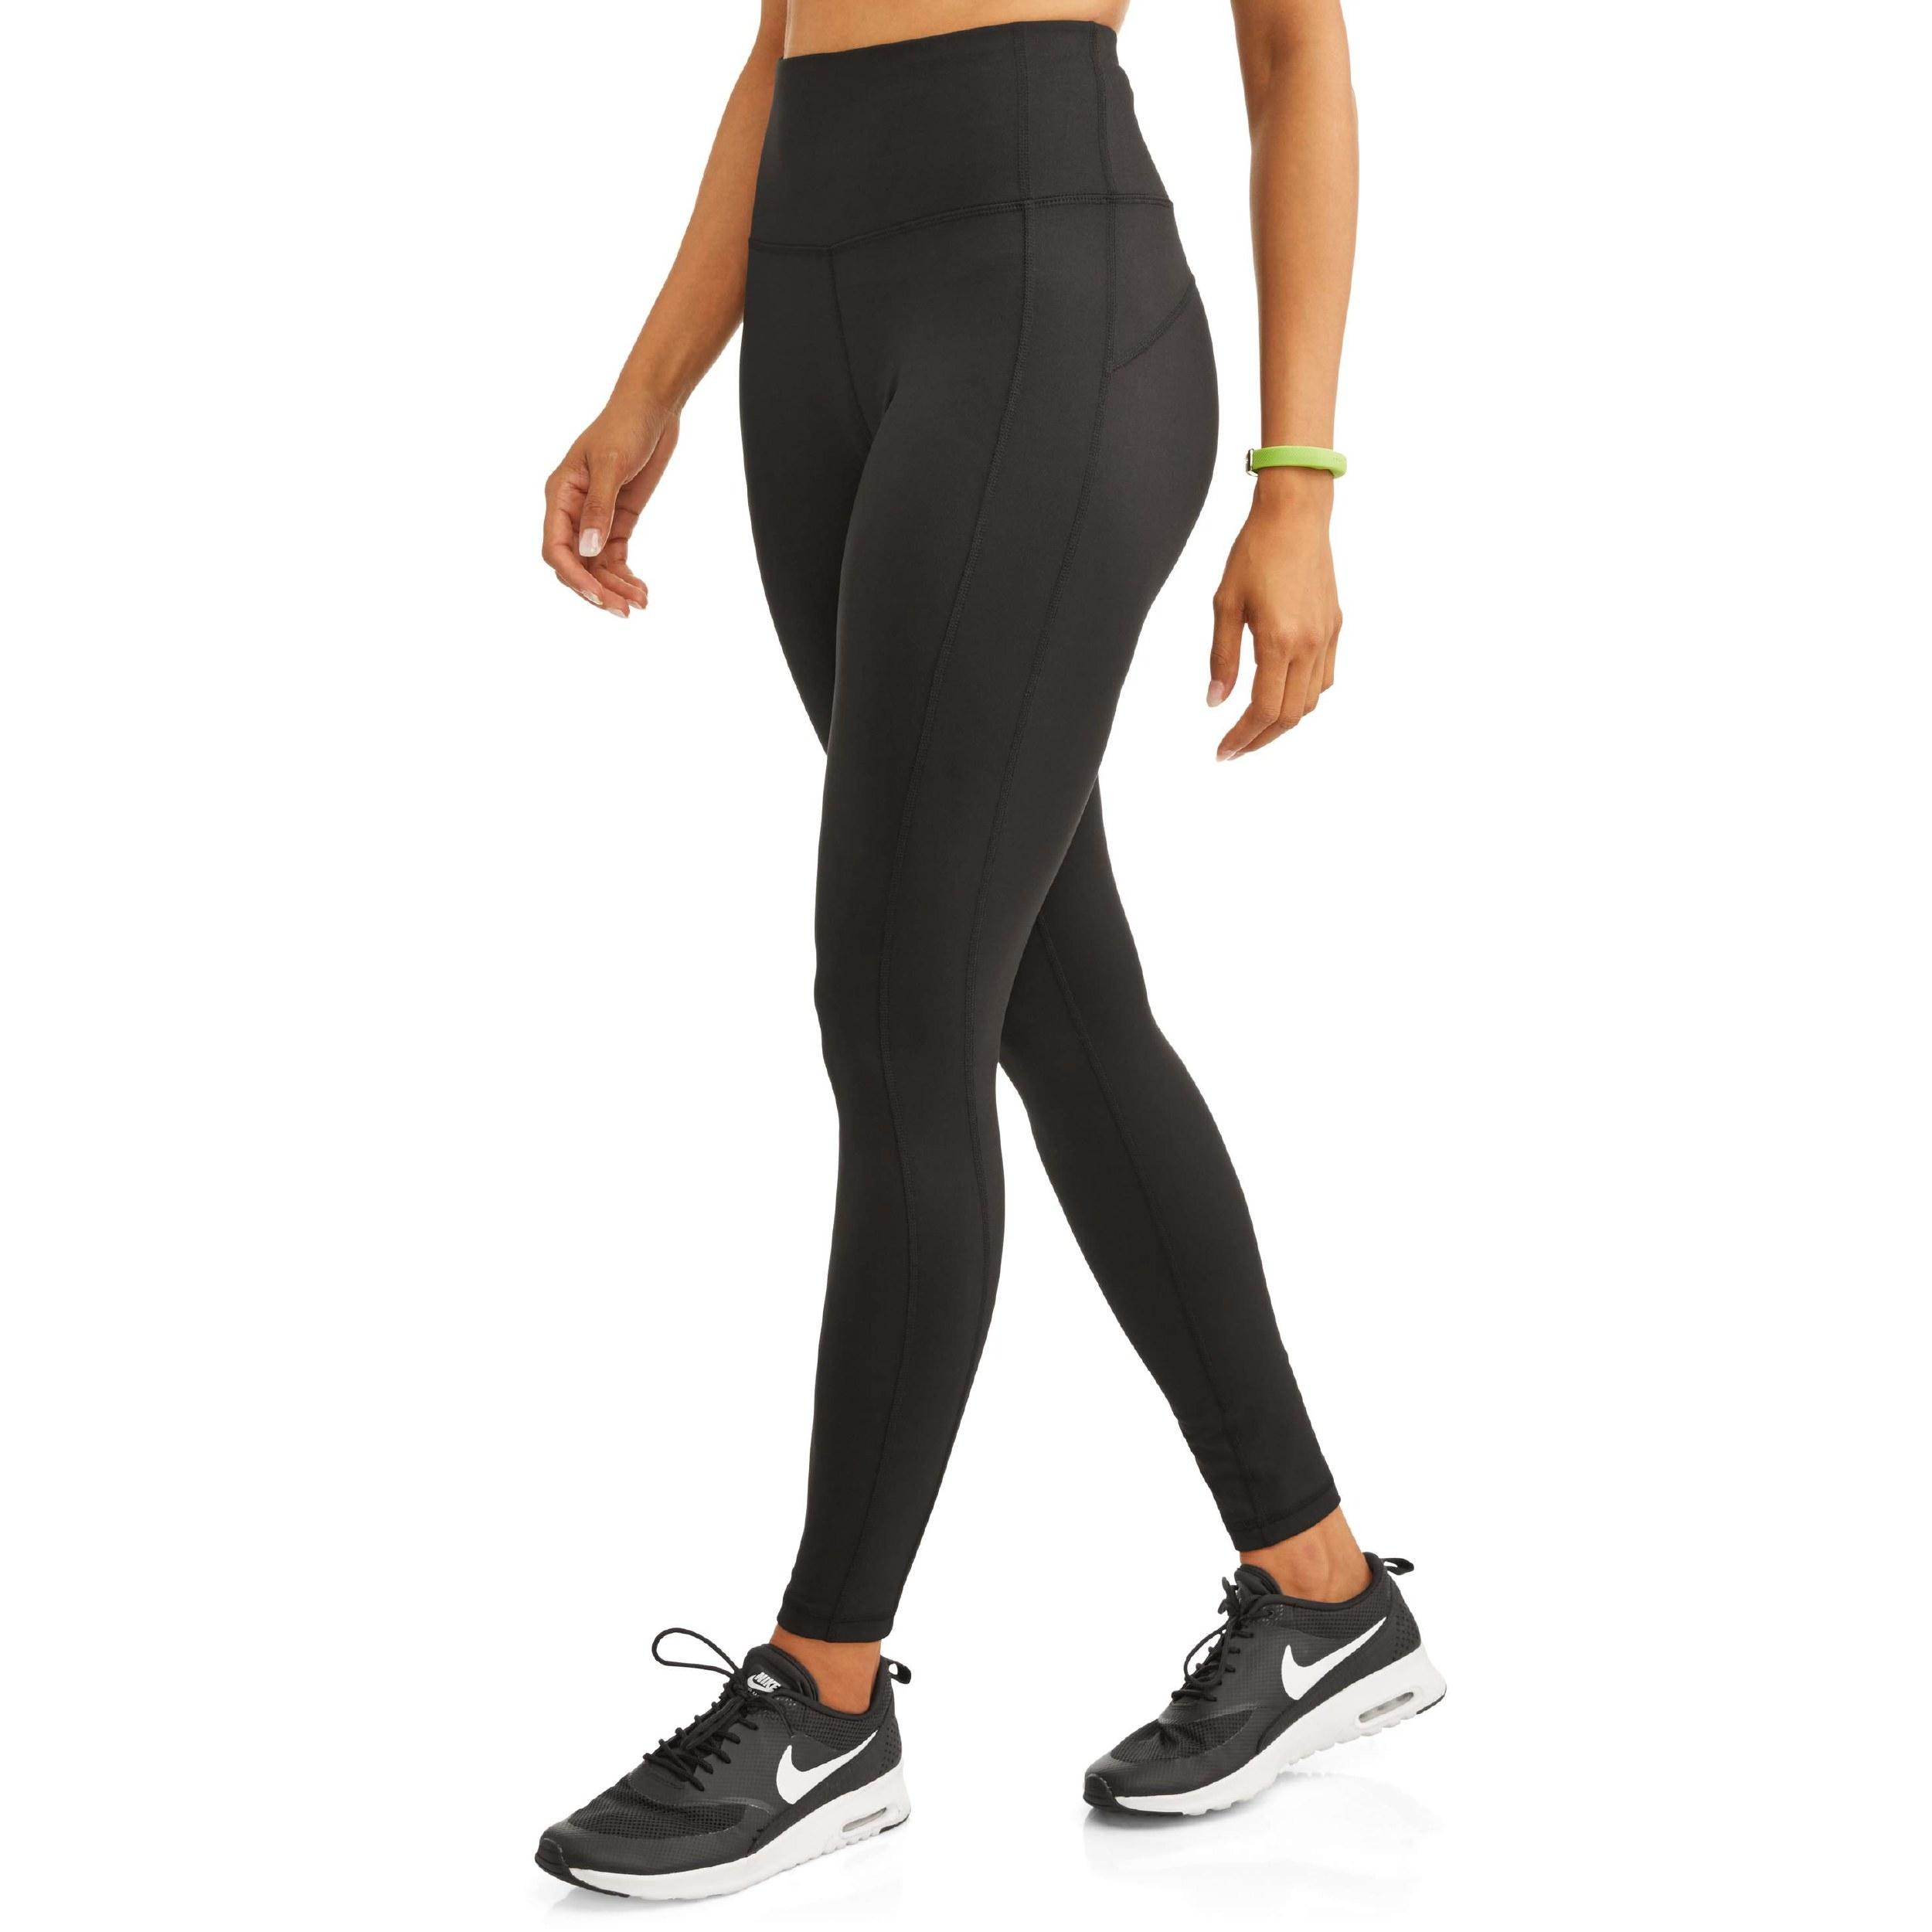 Model wearing the black shiny leggings